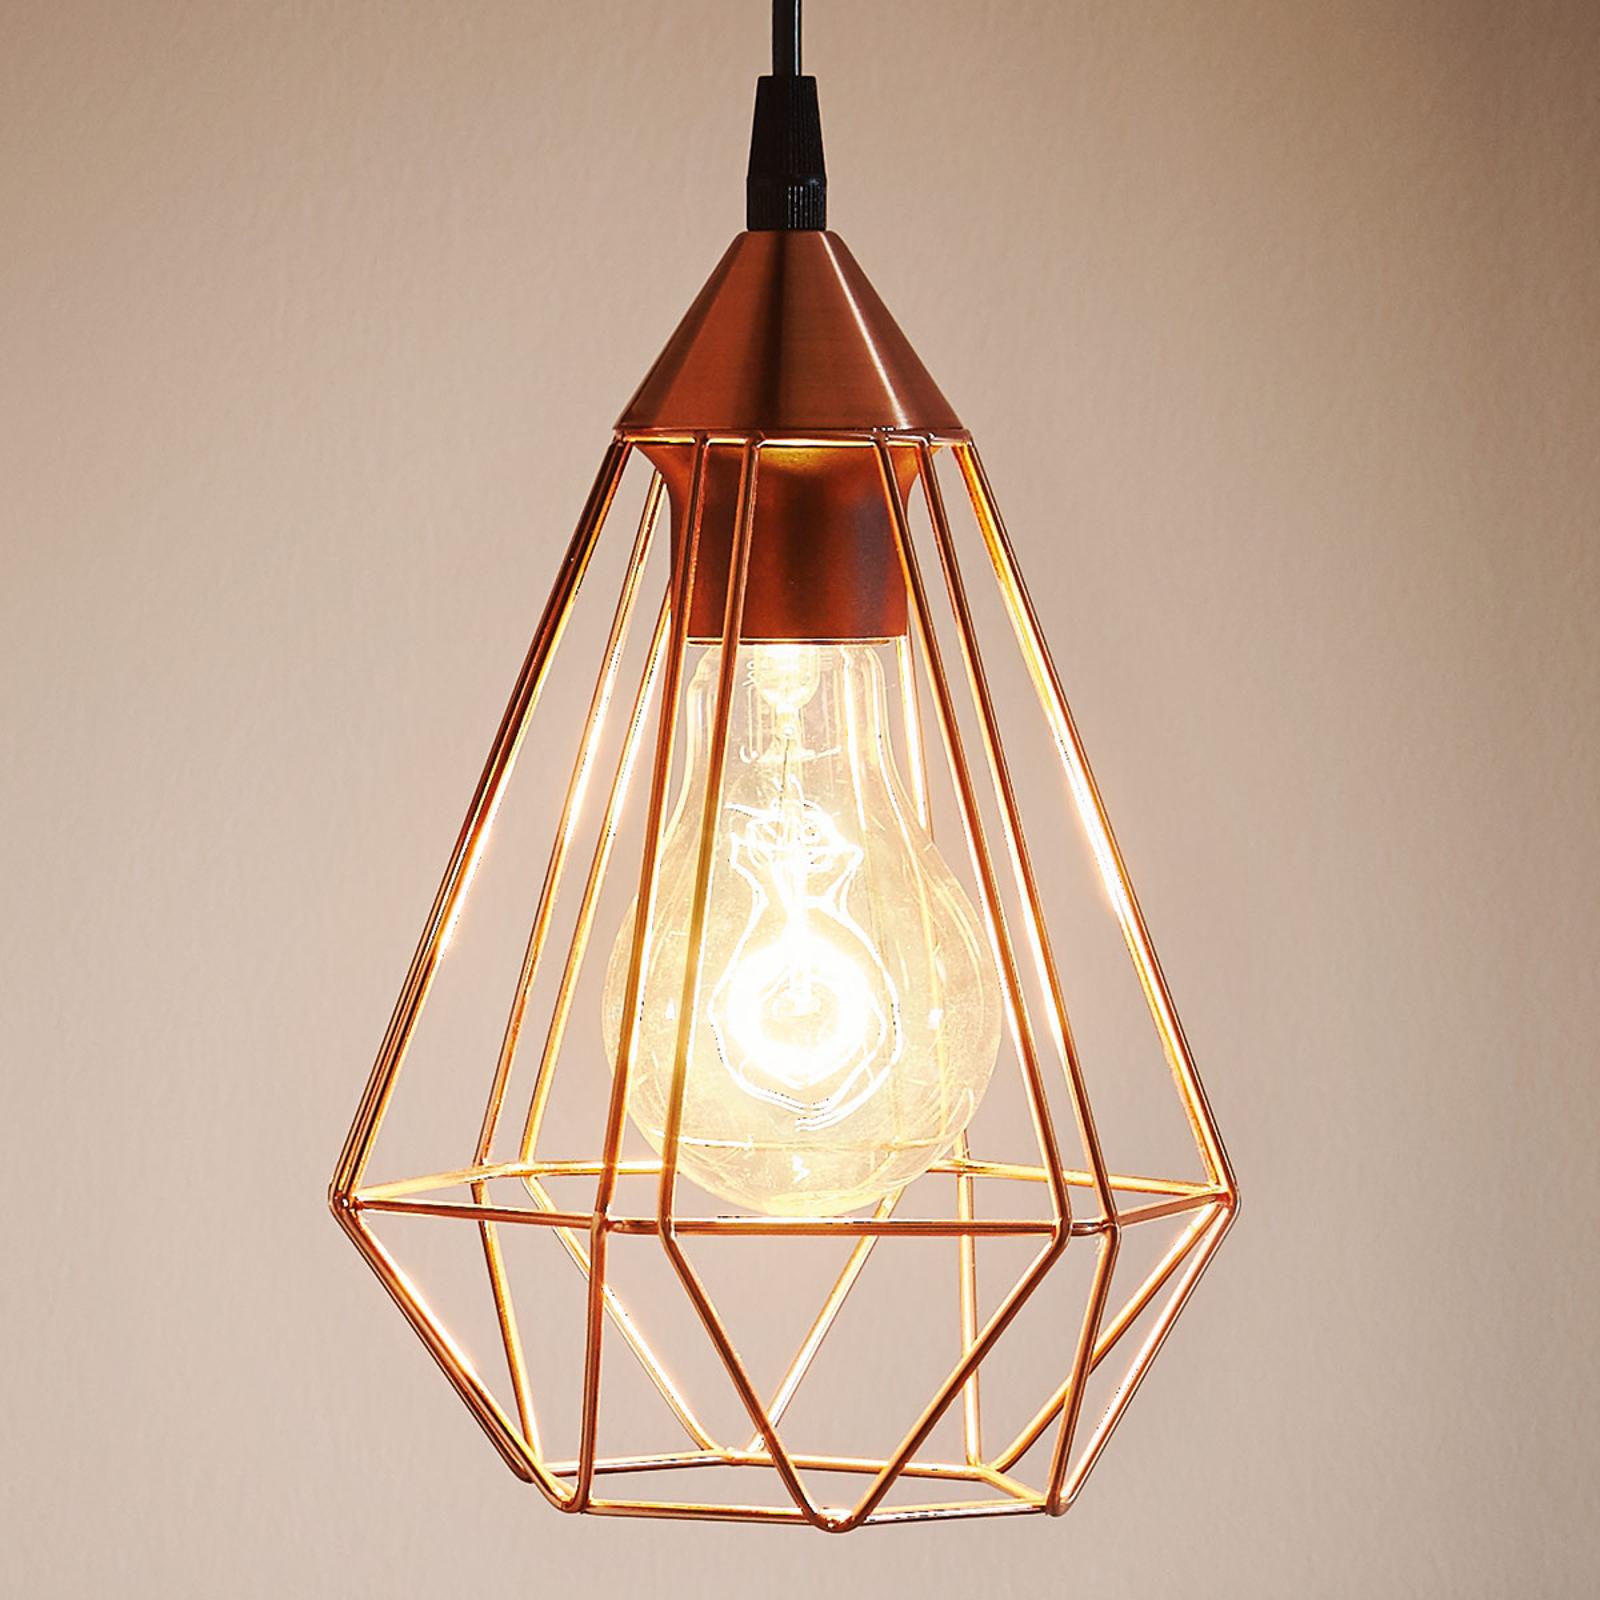 Pendellampa Tarbes, 1 lampa, 17,5 cm, koppar